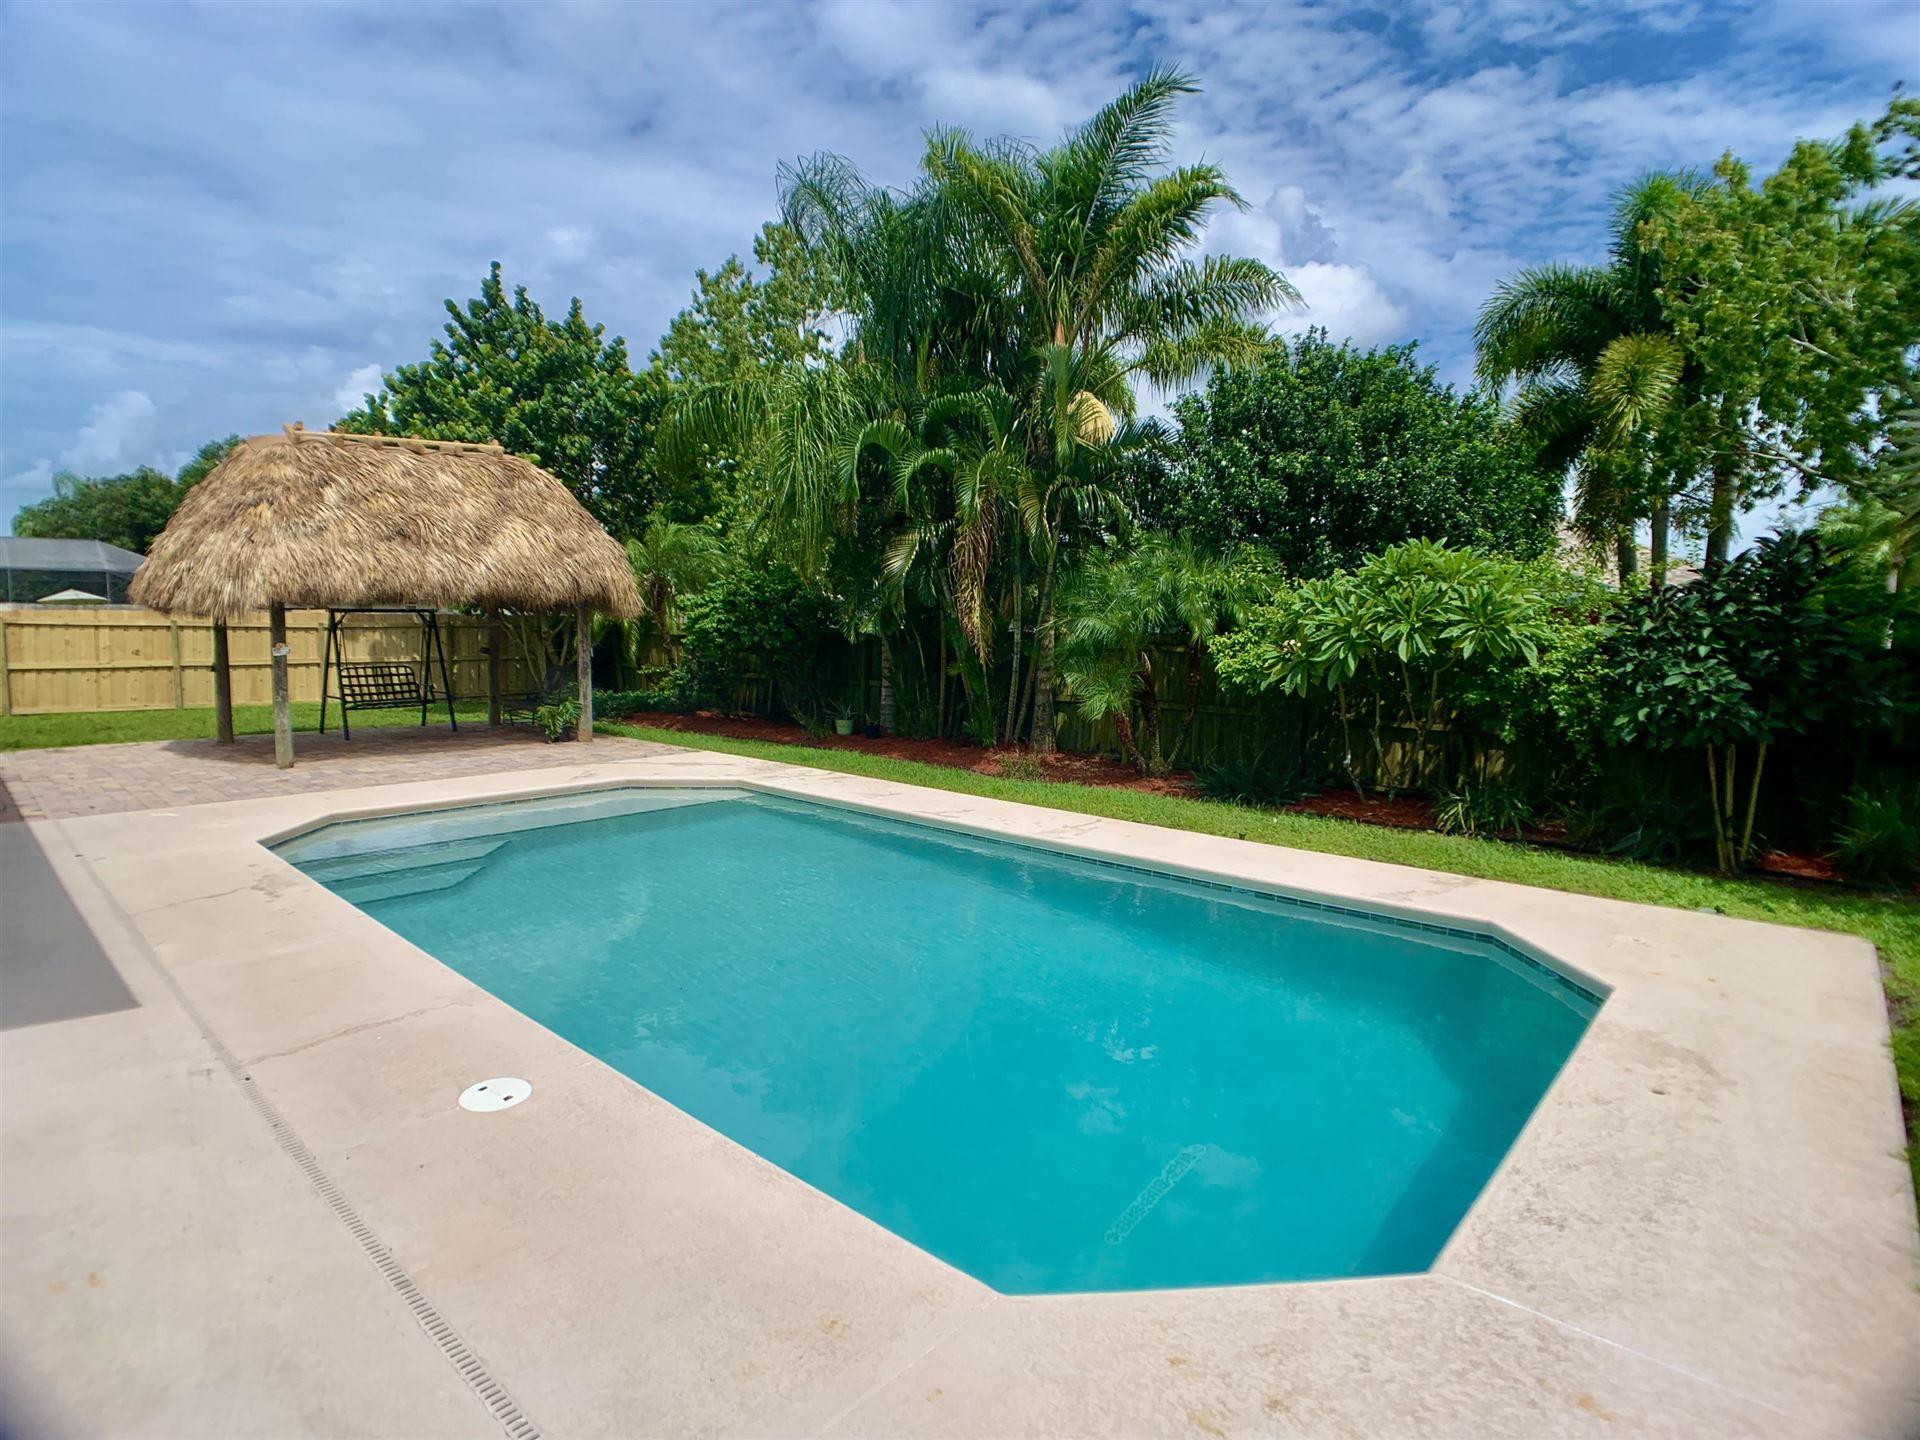 Photo of 5923 NW Ketona Circle, Port Saint Lucie, FL 34986 (MLS # RX-10736315)